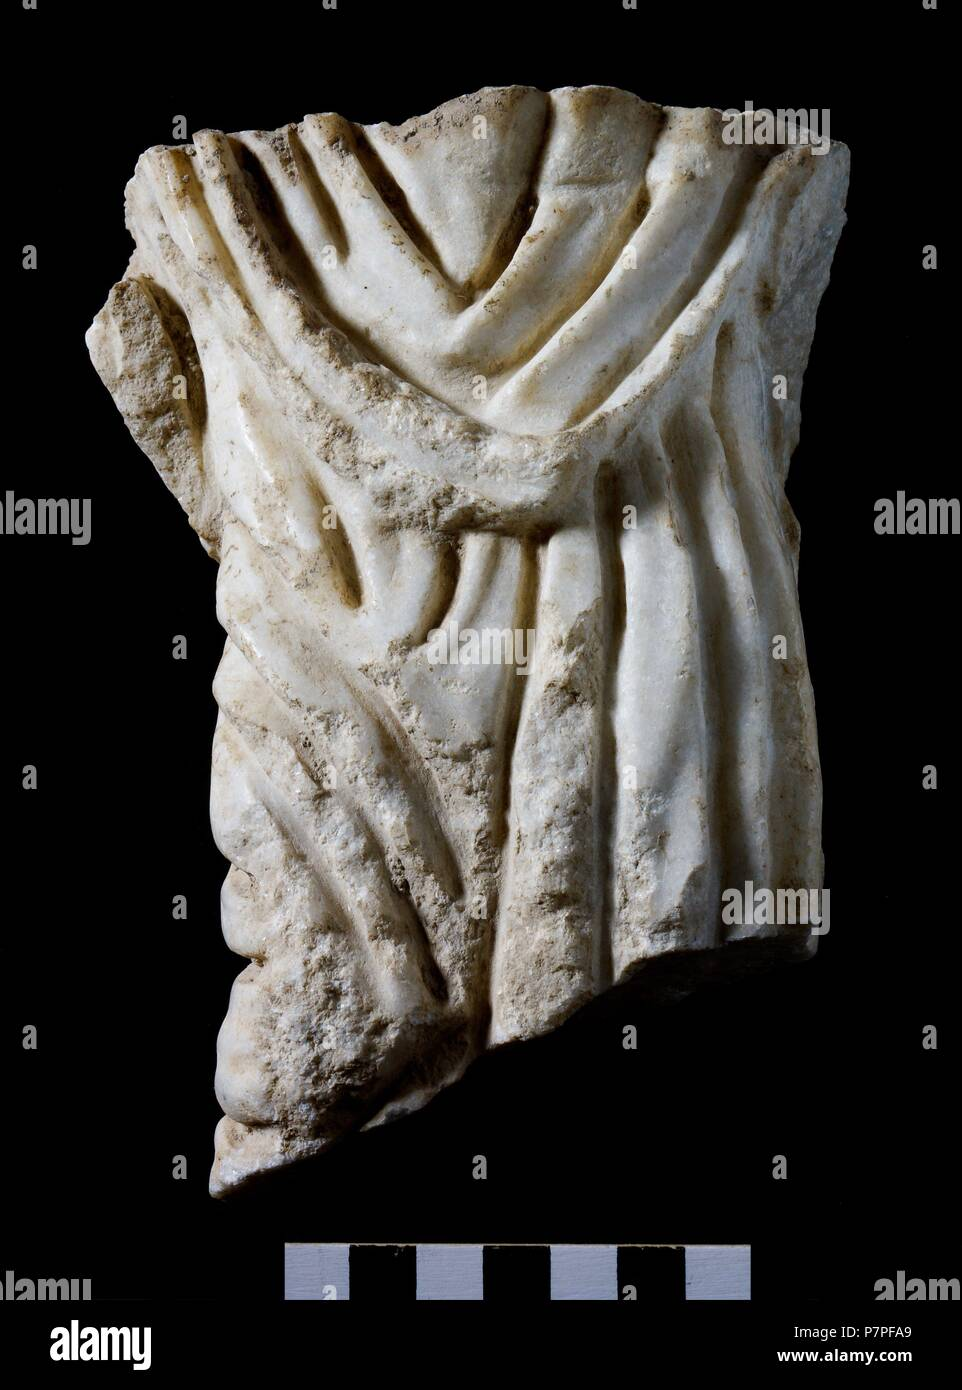 FRAGMENTOS DEL SARCOFAGO DE BEGASTRI. DEPOSITO: MUSEO ARQUEOLOGICO DE CEHEGIN  . MURCIA, ESPAÑA. - Stock Image